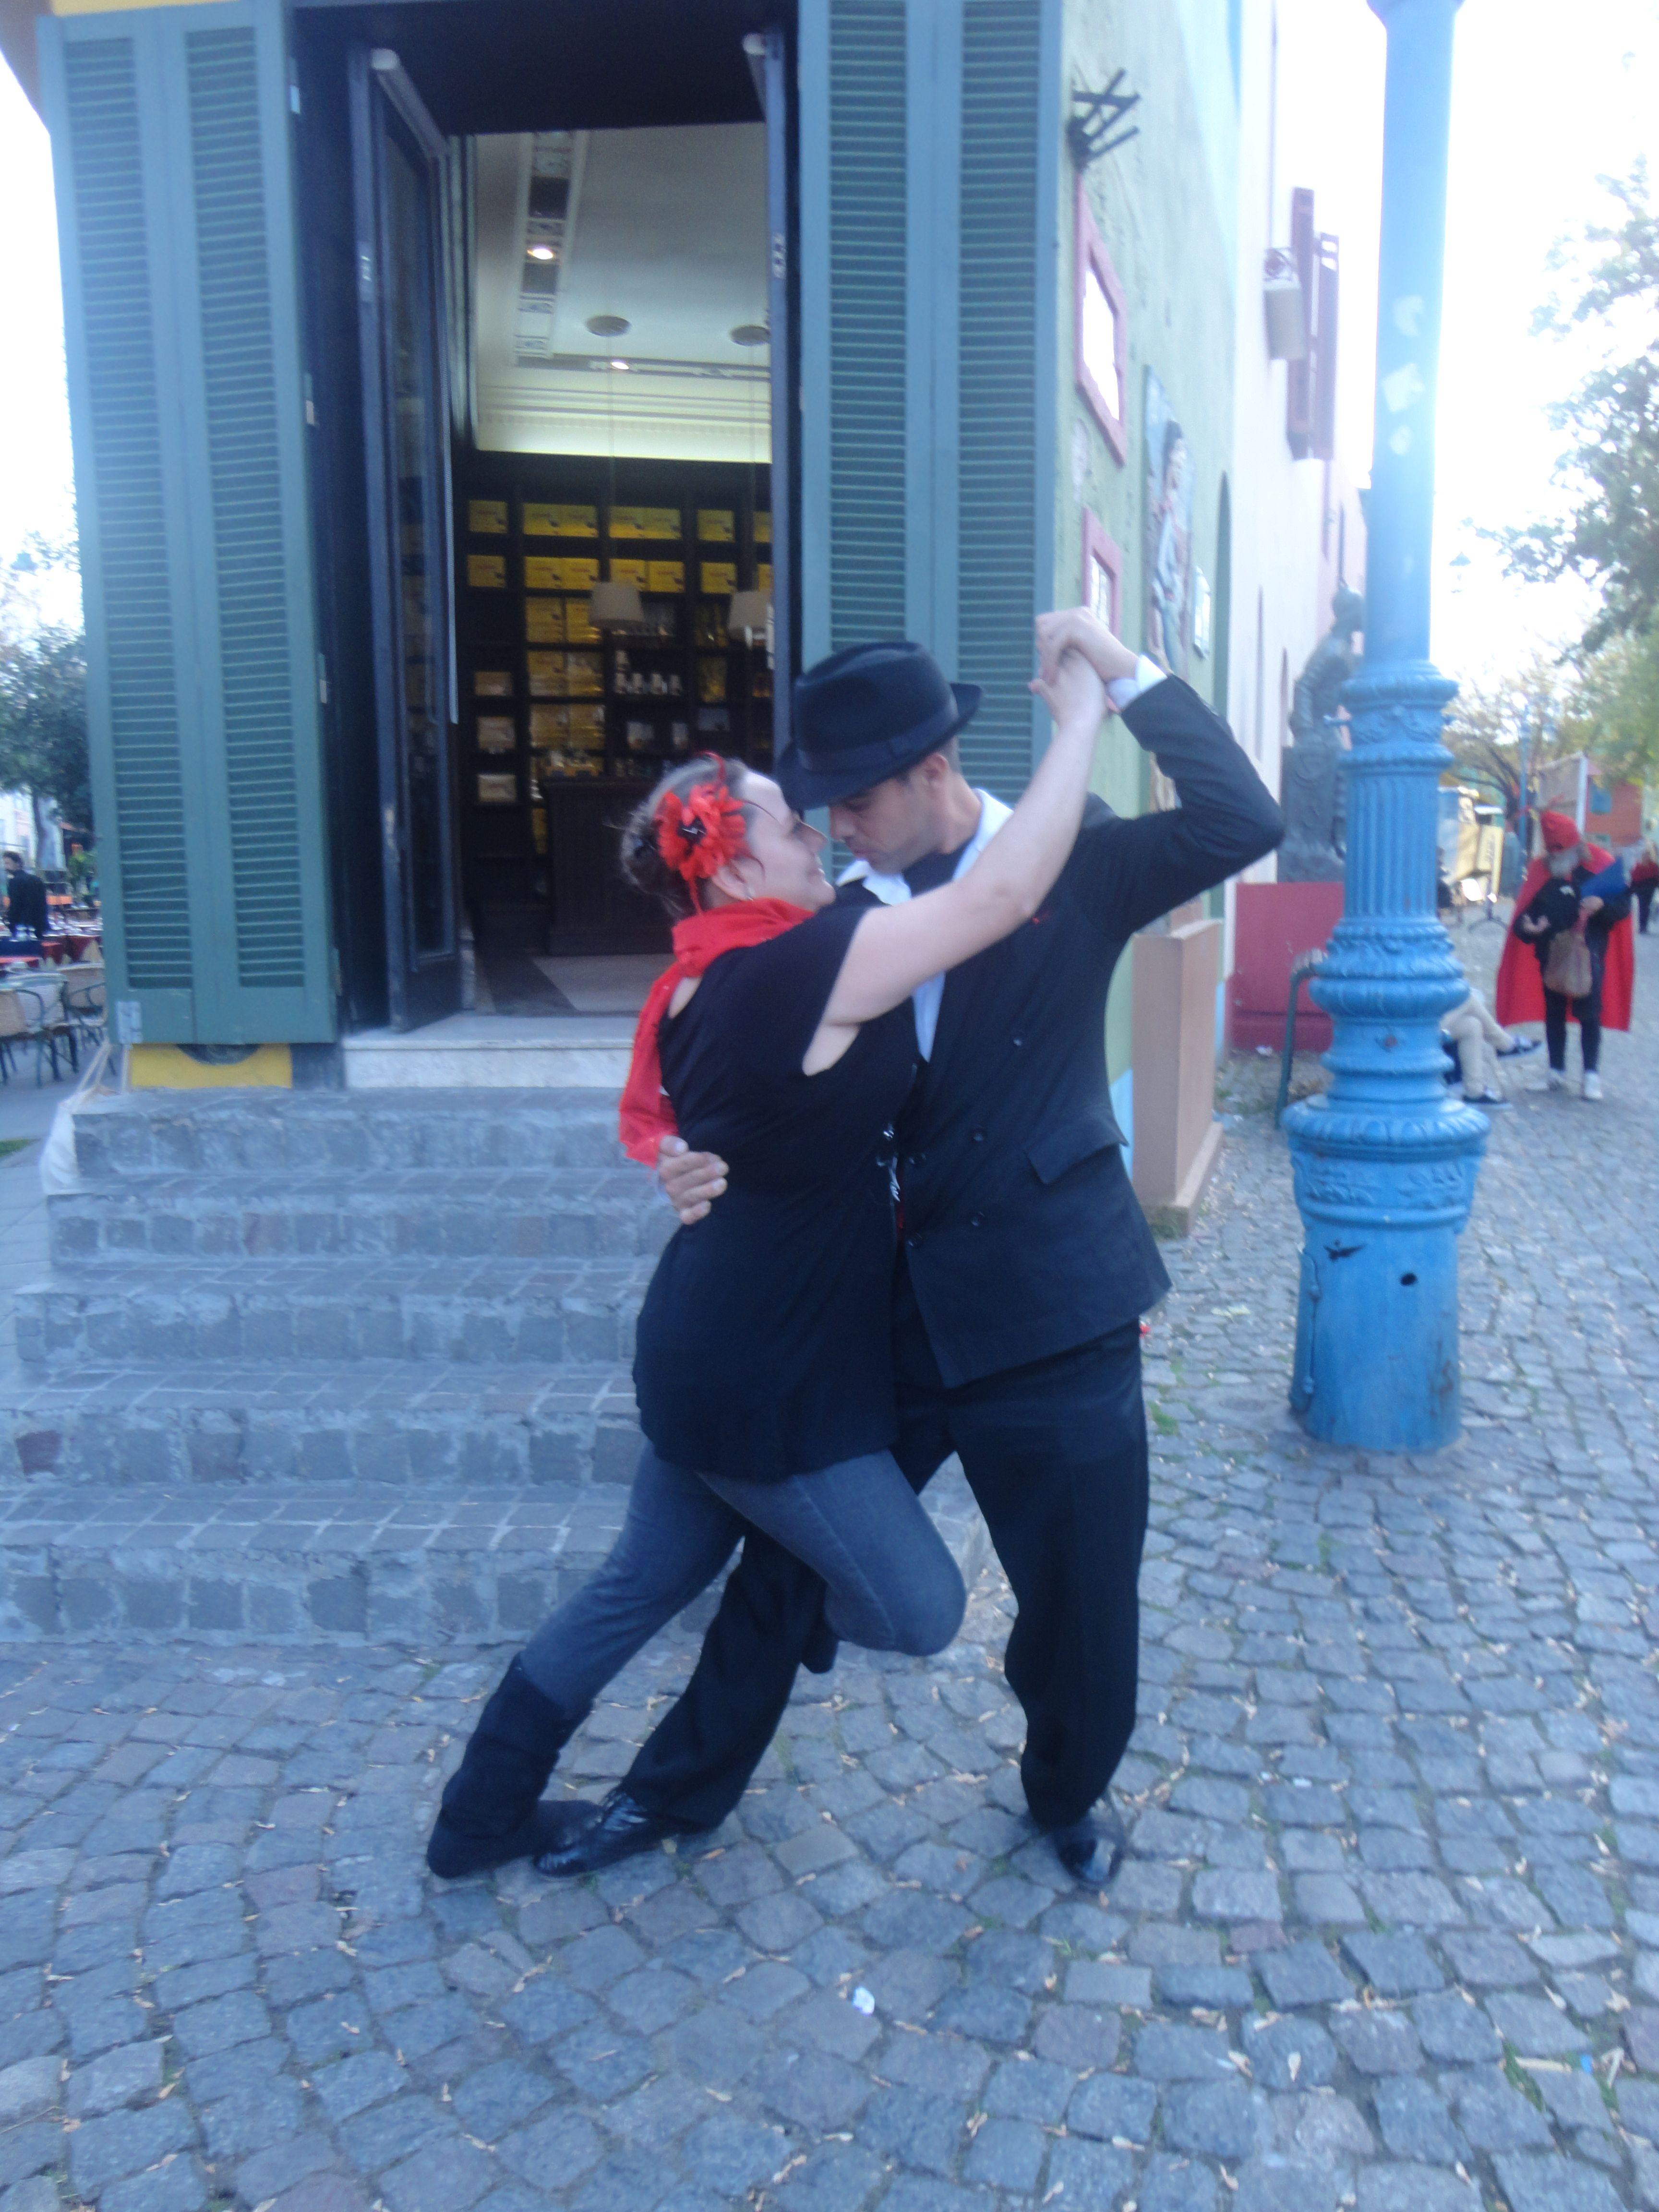 Mi gusta bailar un tango!!!